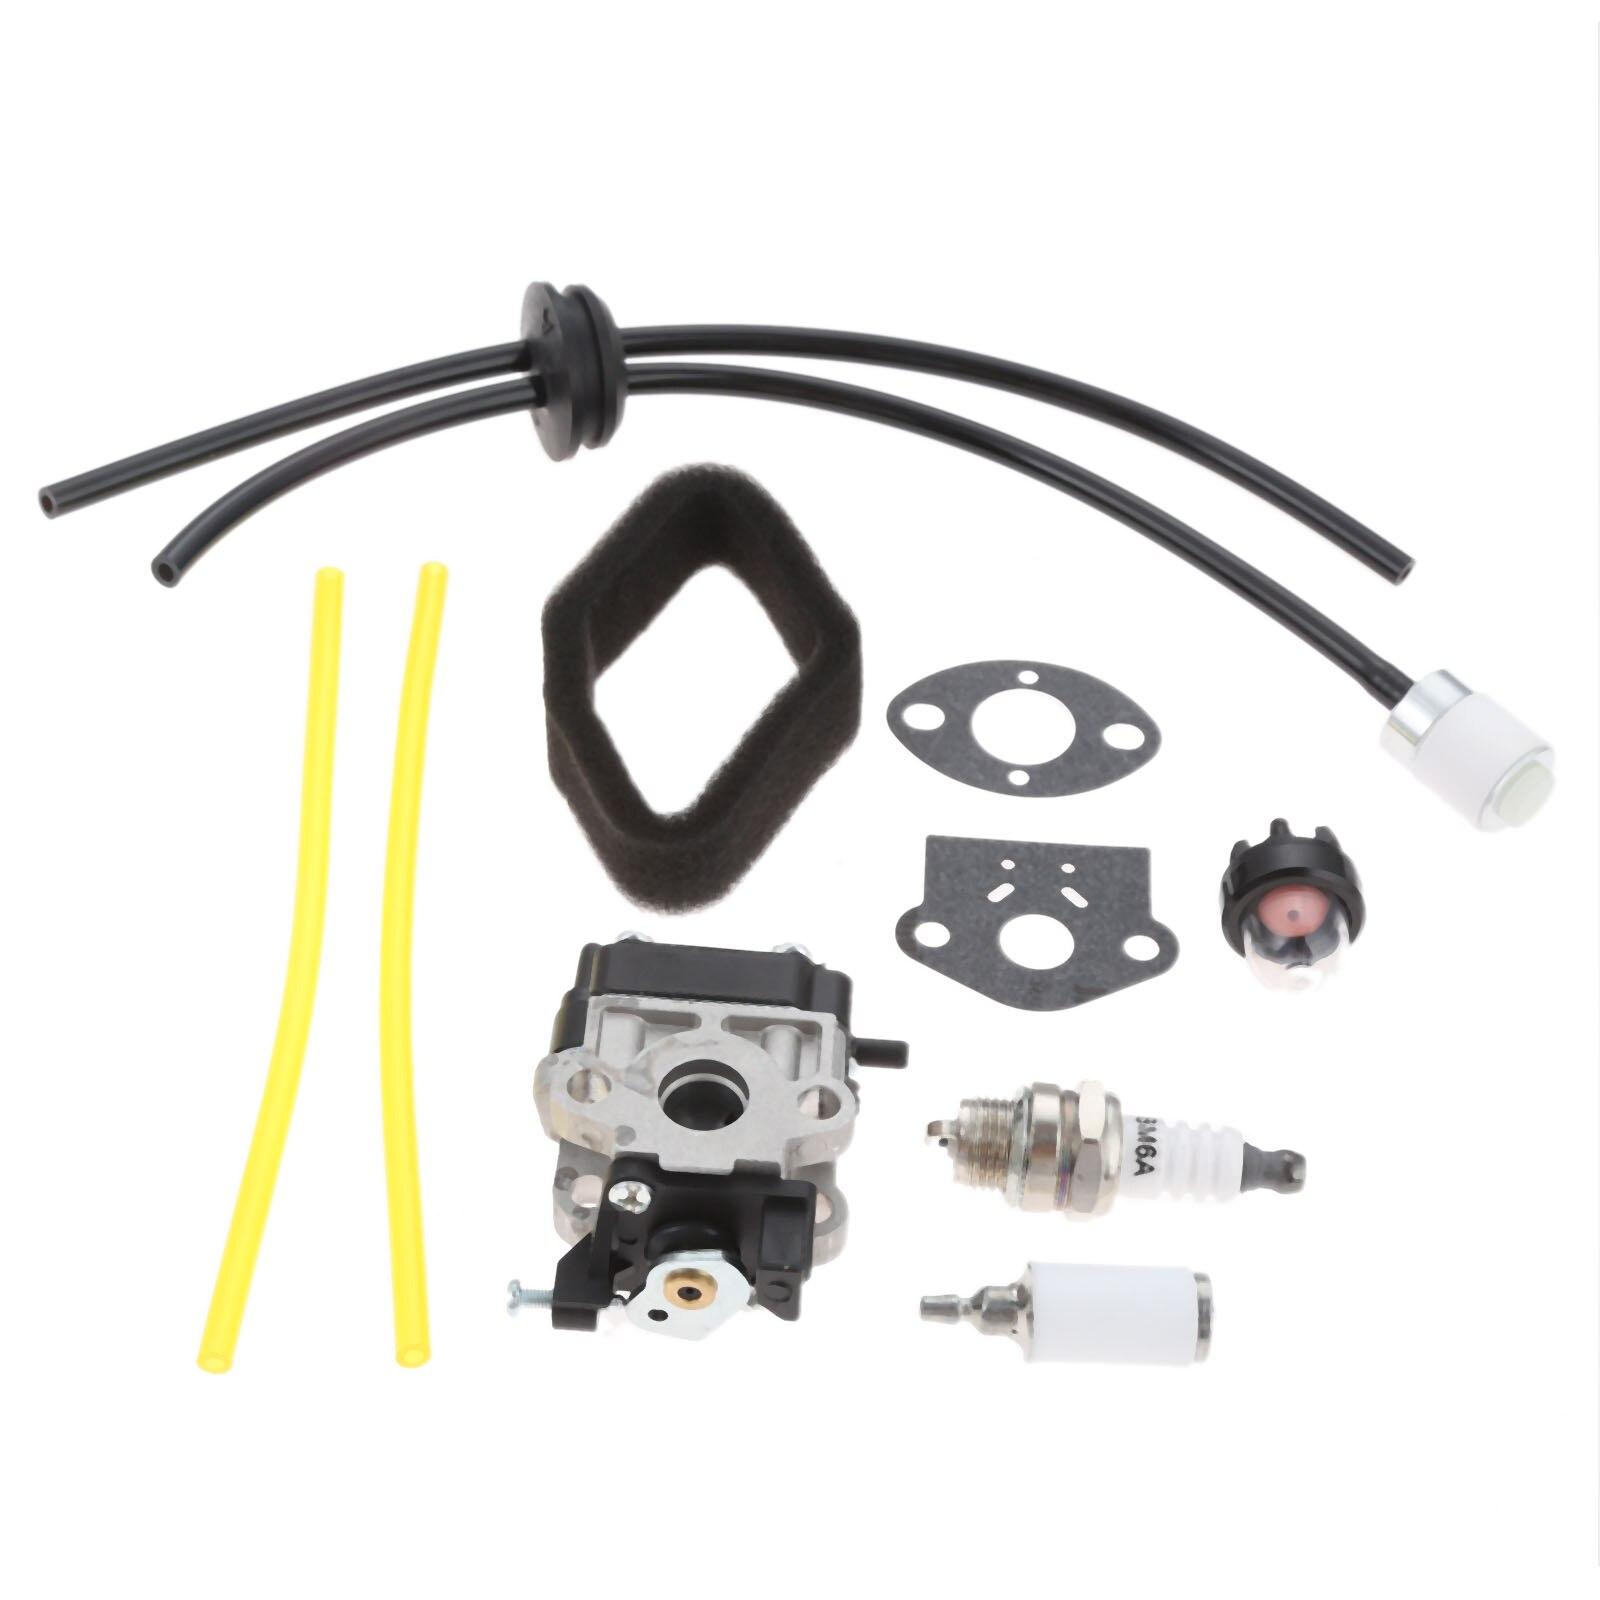 DRELD Carburetor Carb Rebuild Kit For Homelite BM254BV SC254BV Blower Toro 51944 51945 Power Head Replace 308480001 WYC-7-1